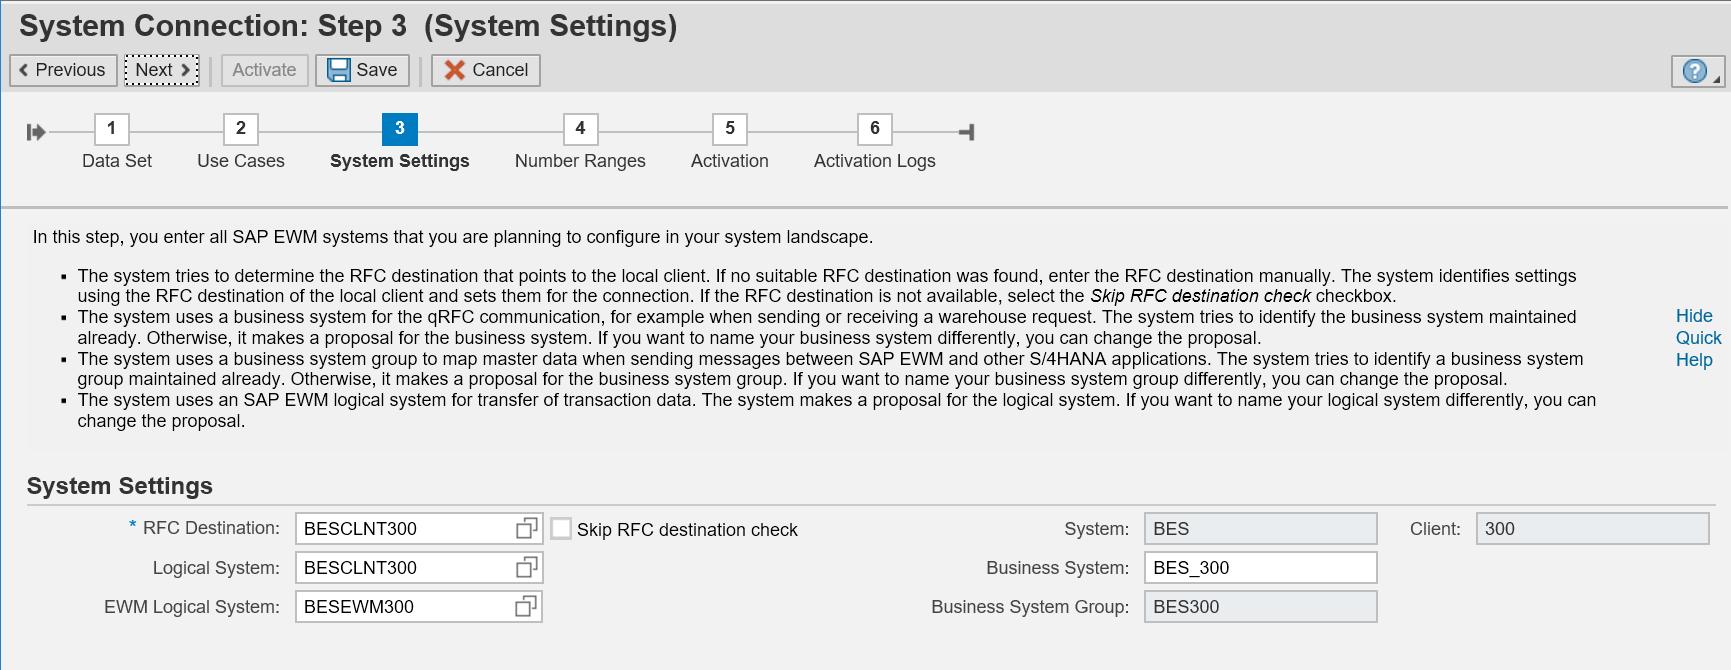 Basic Settings for SAP EWM in SAP S/4HANA 1709   SAP Blogs